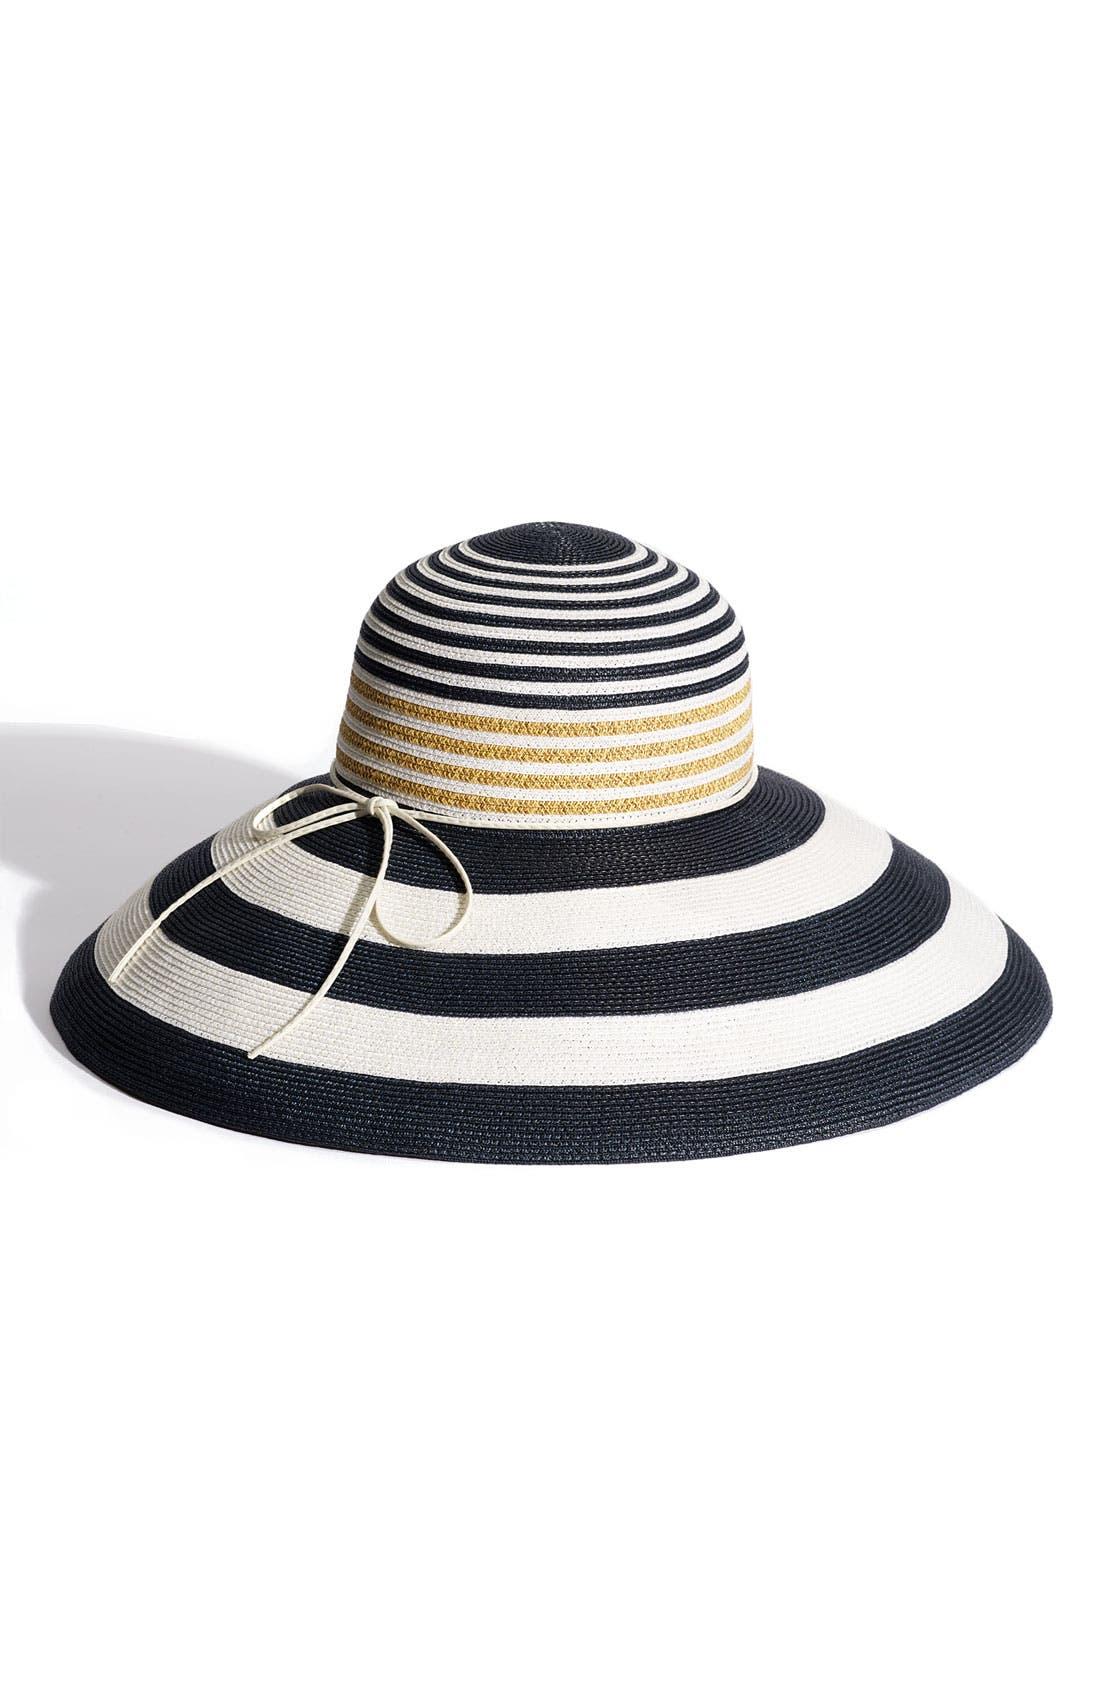 Main Image - Laundry by Shelli Segal 'Nicole' Sun Hat